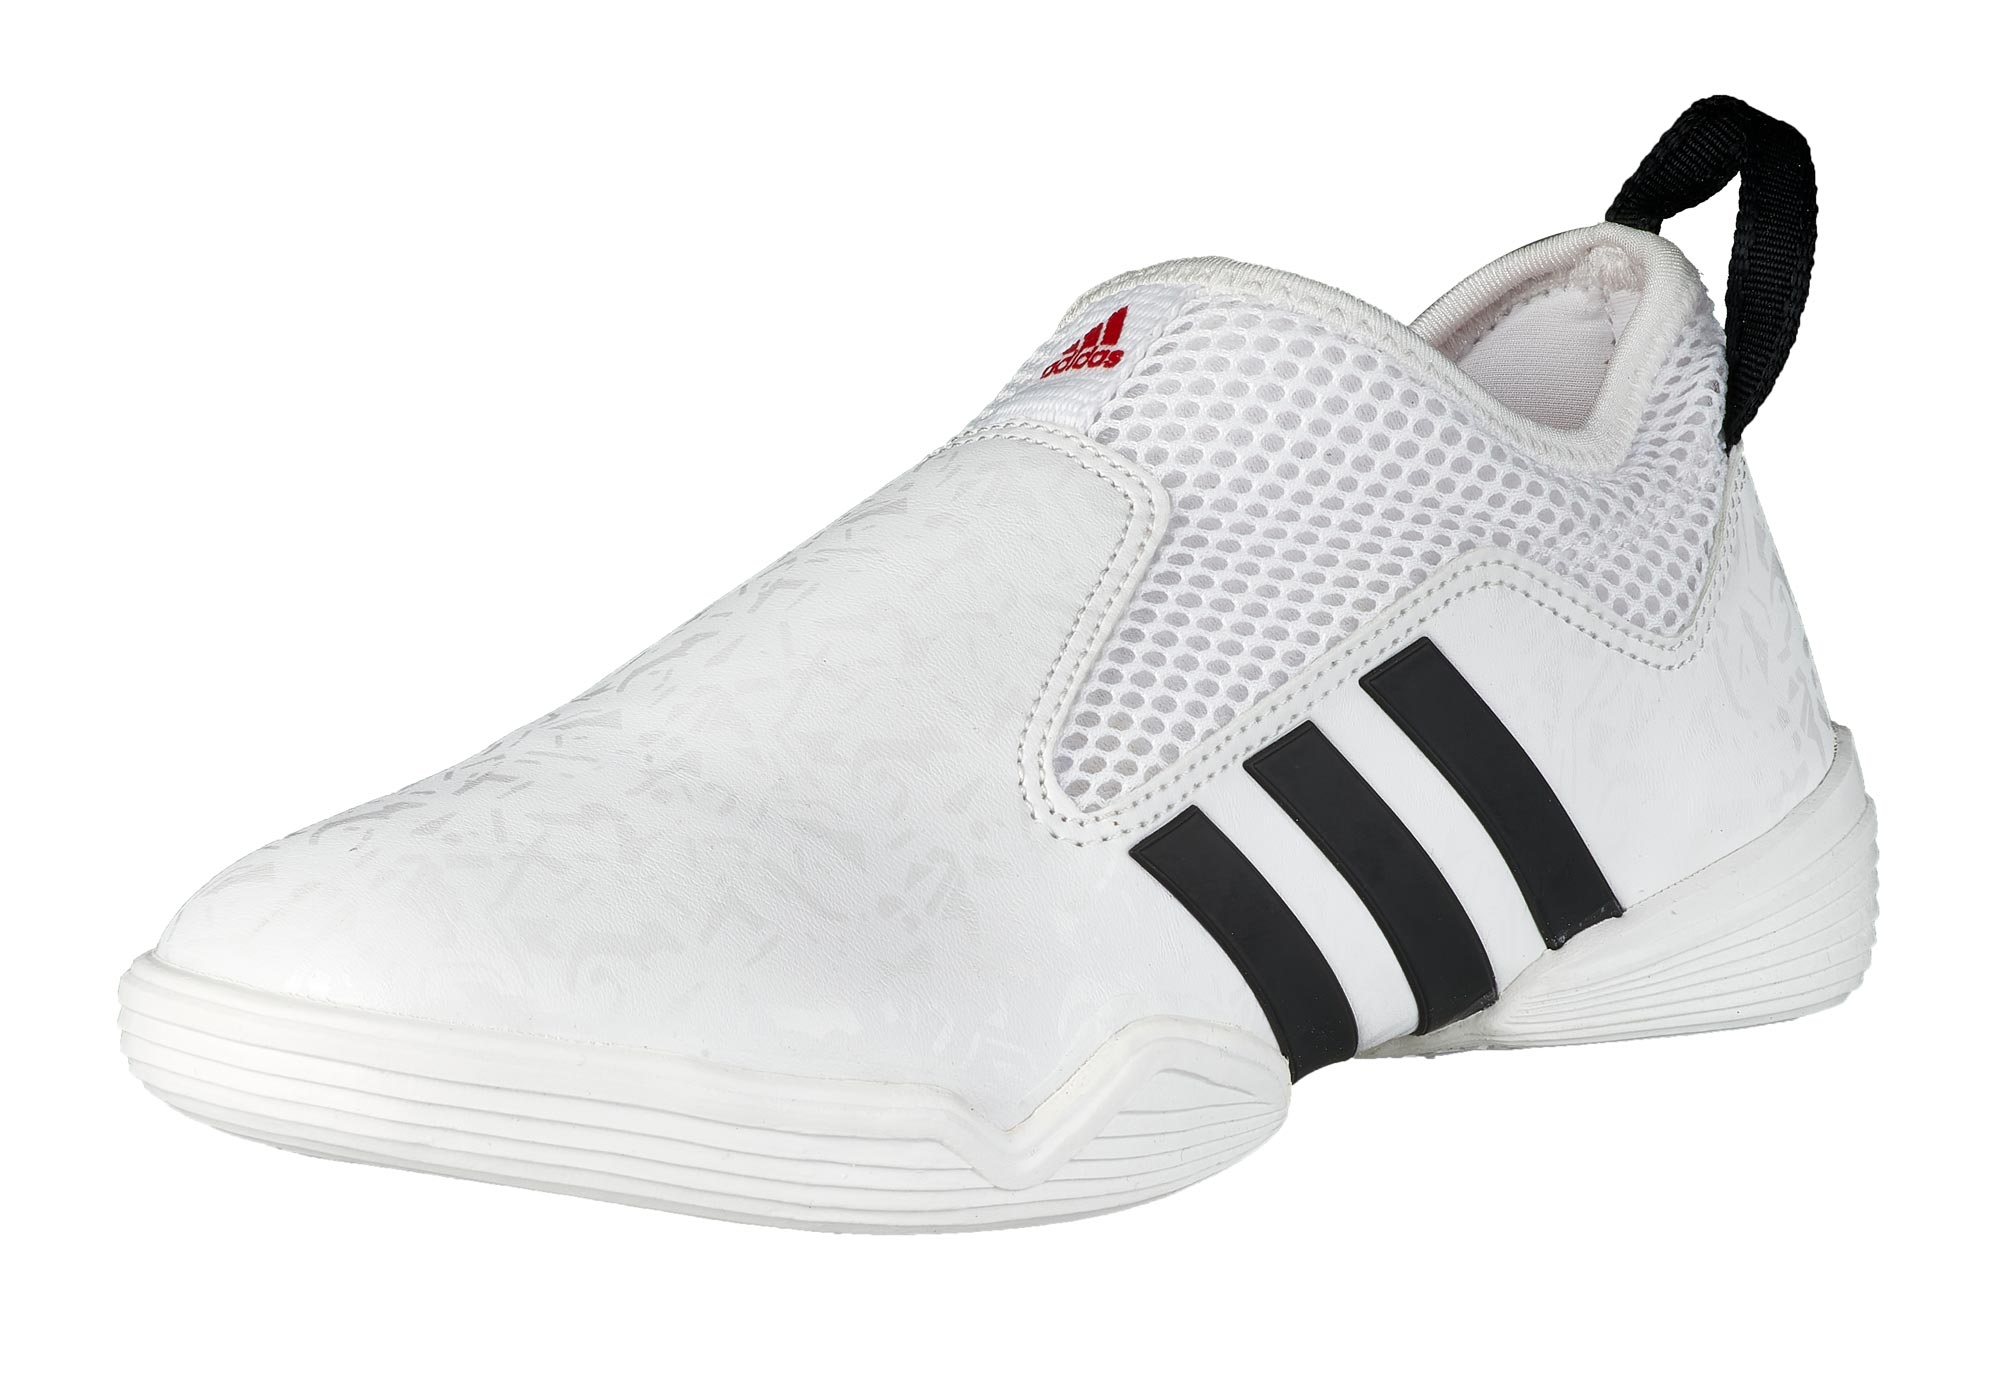 Chaussure de Taekwondo Adidas Adibras à 60,00 €